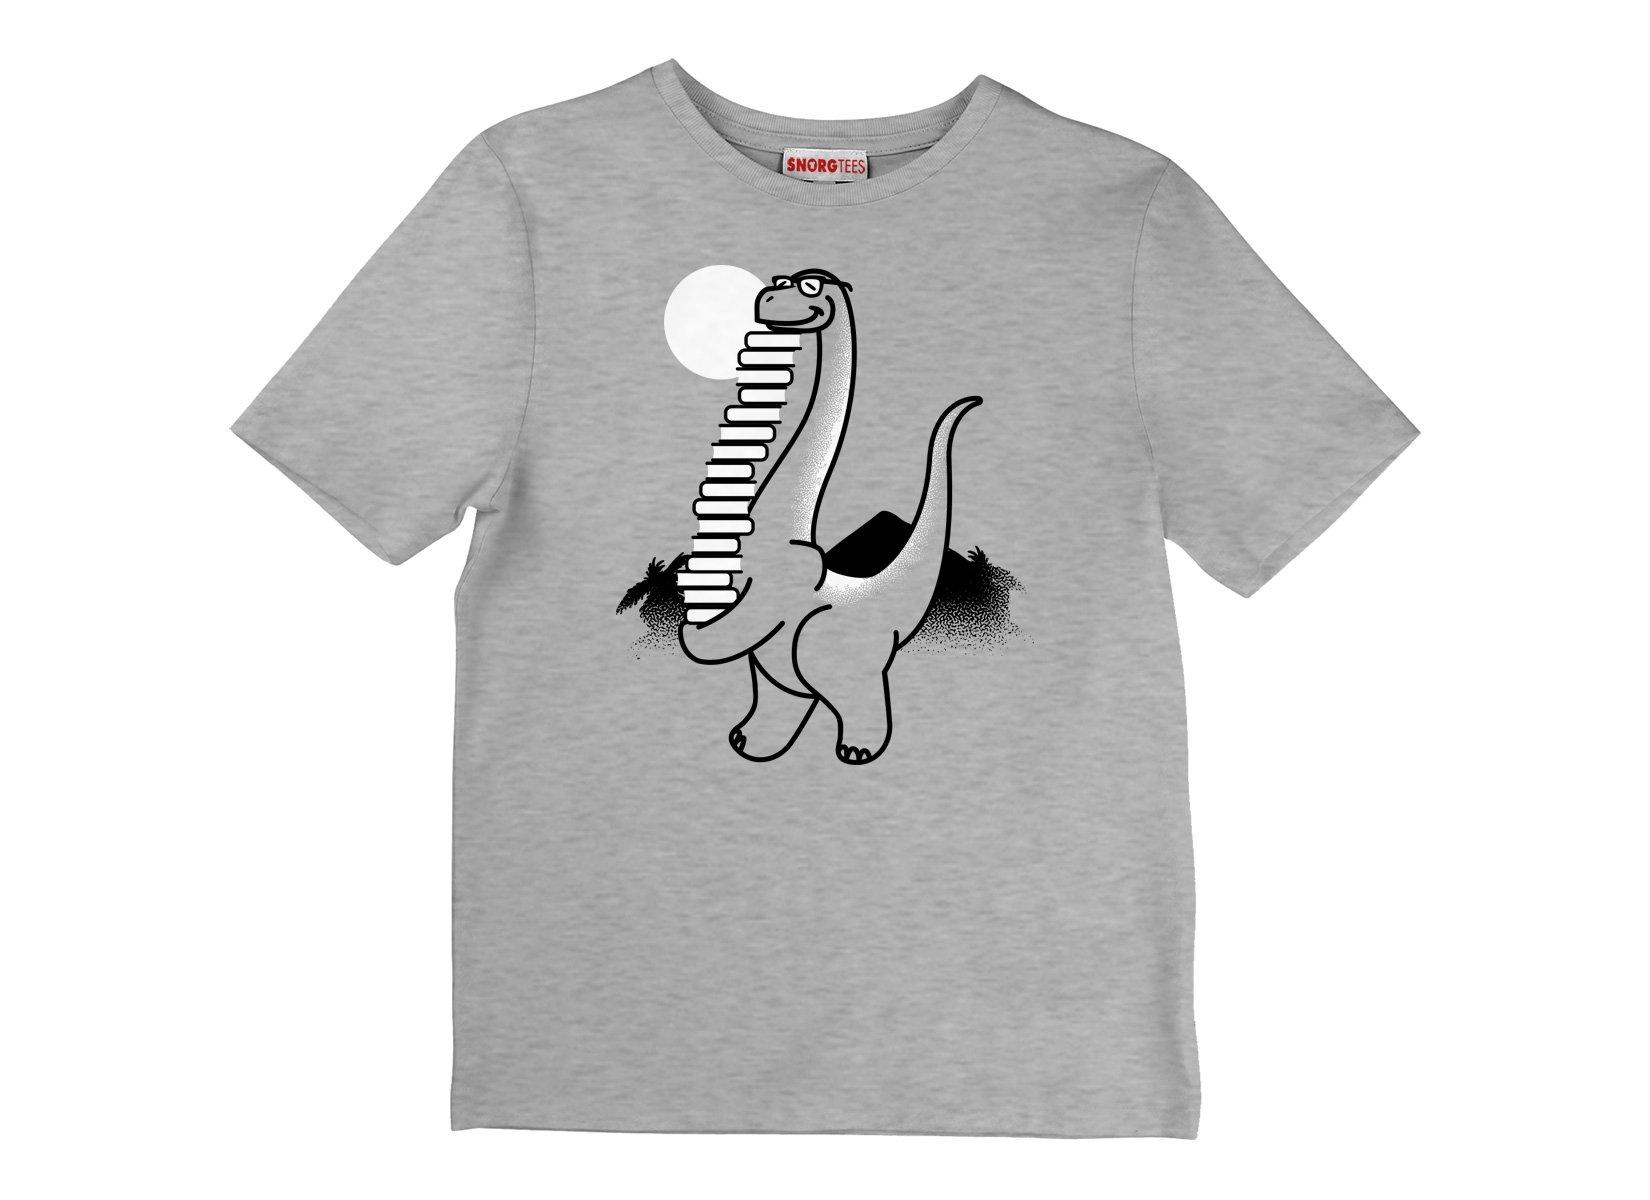 Bookosaurus on Kids T-Shirt